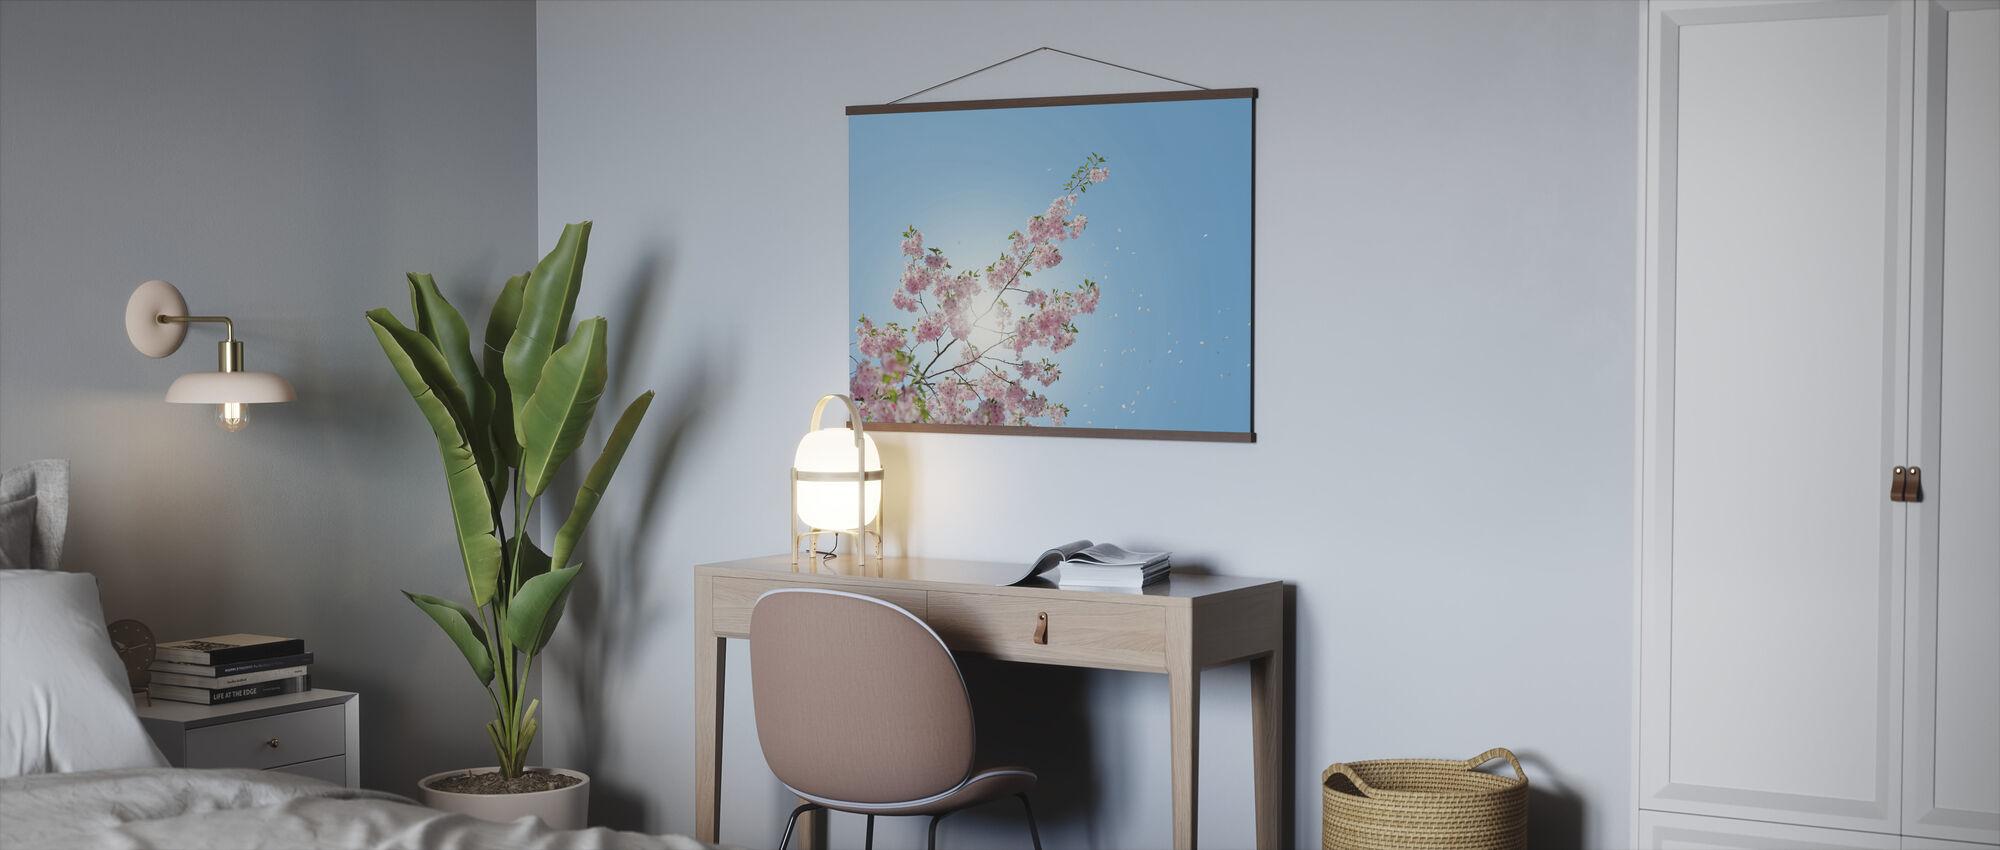 Falling Petals - Poster - Office